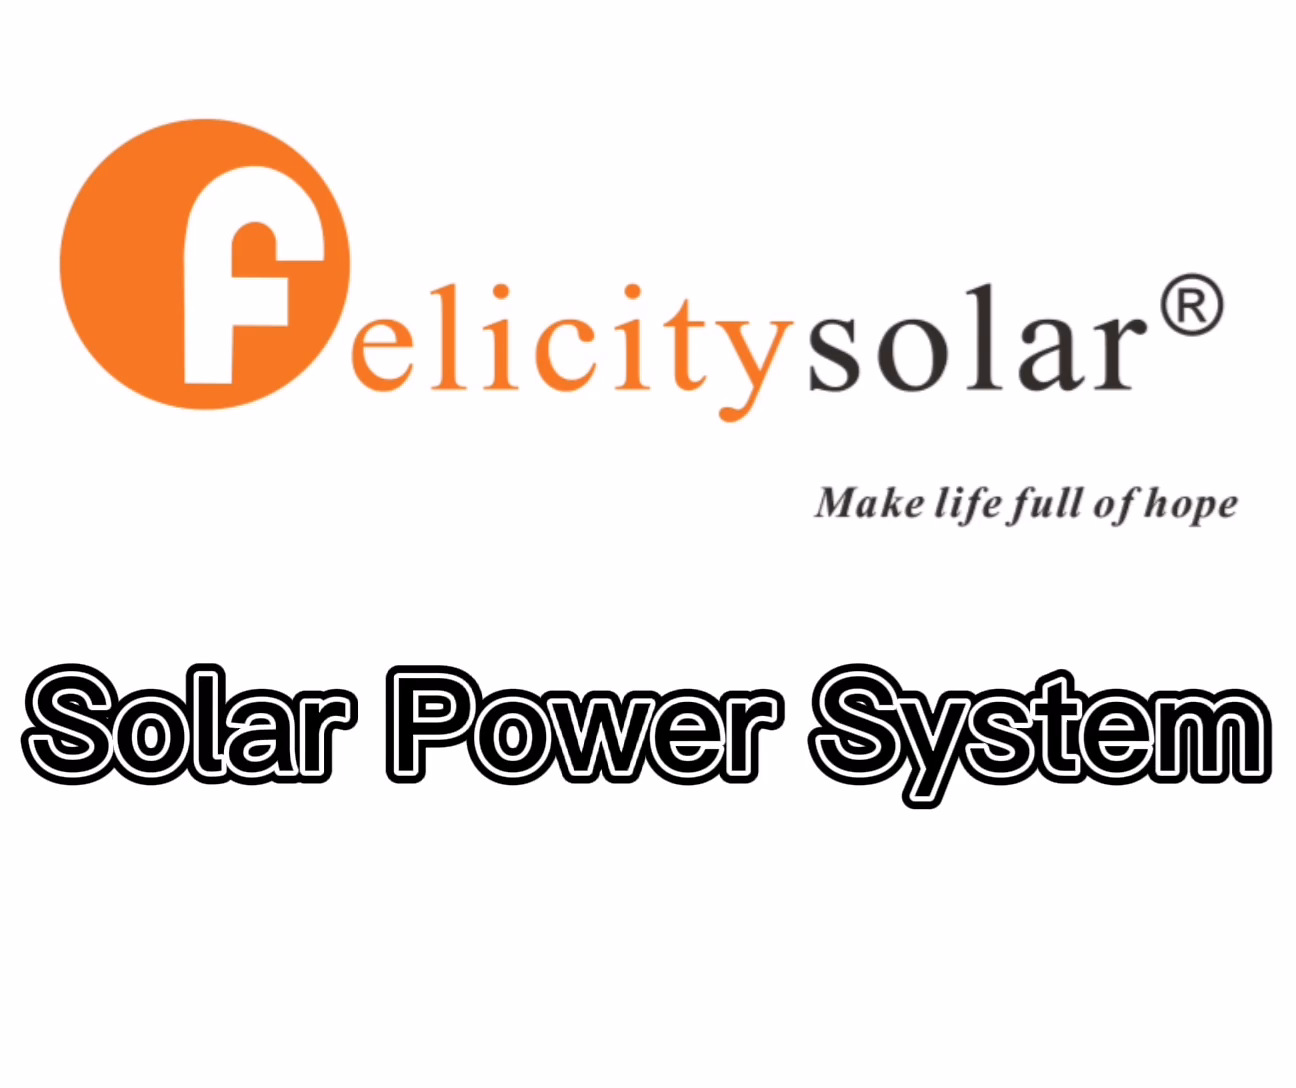 सौर ऊर्जा प्रणाली 10Kw और 220V एसी ग्रिड बंधे सौर ऊर्जा प्रणाली समाधान